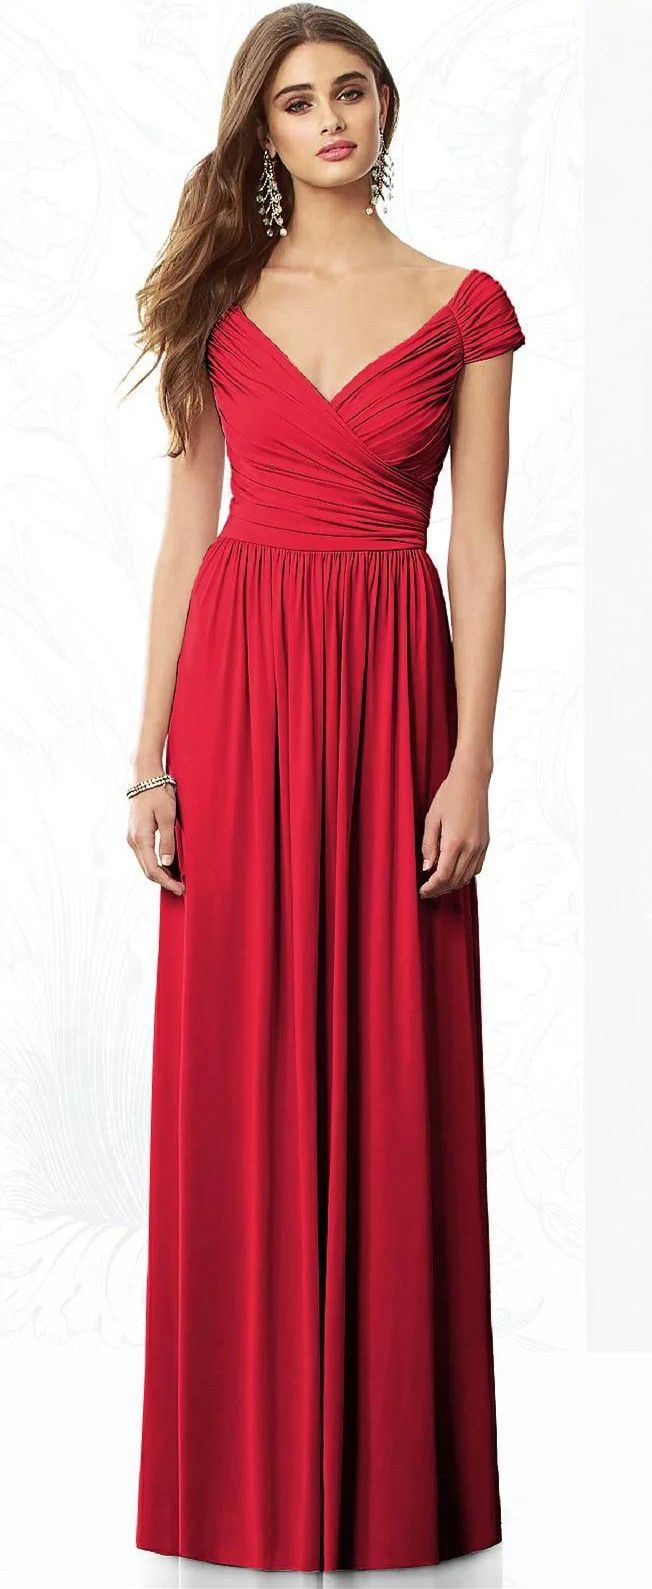 best bridesmaid dresses images on pinterest weddings